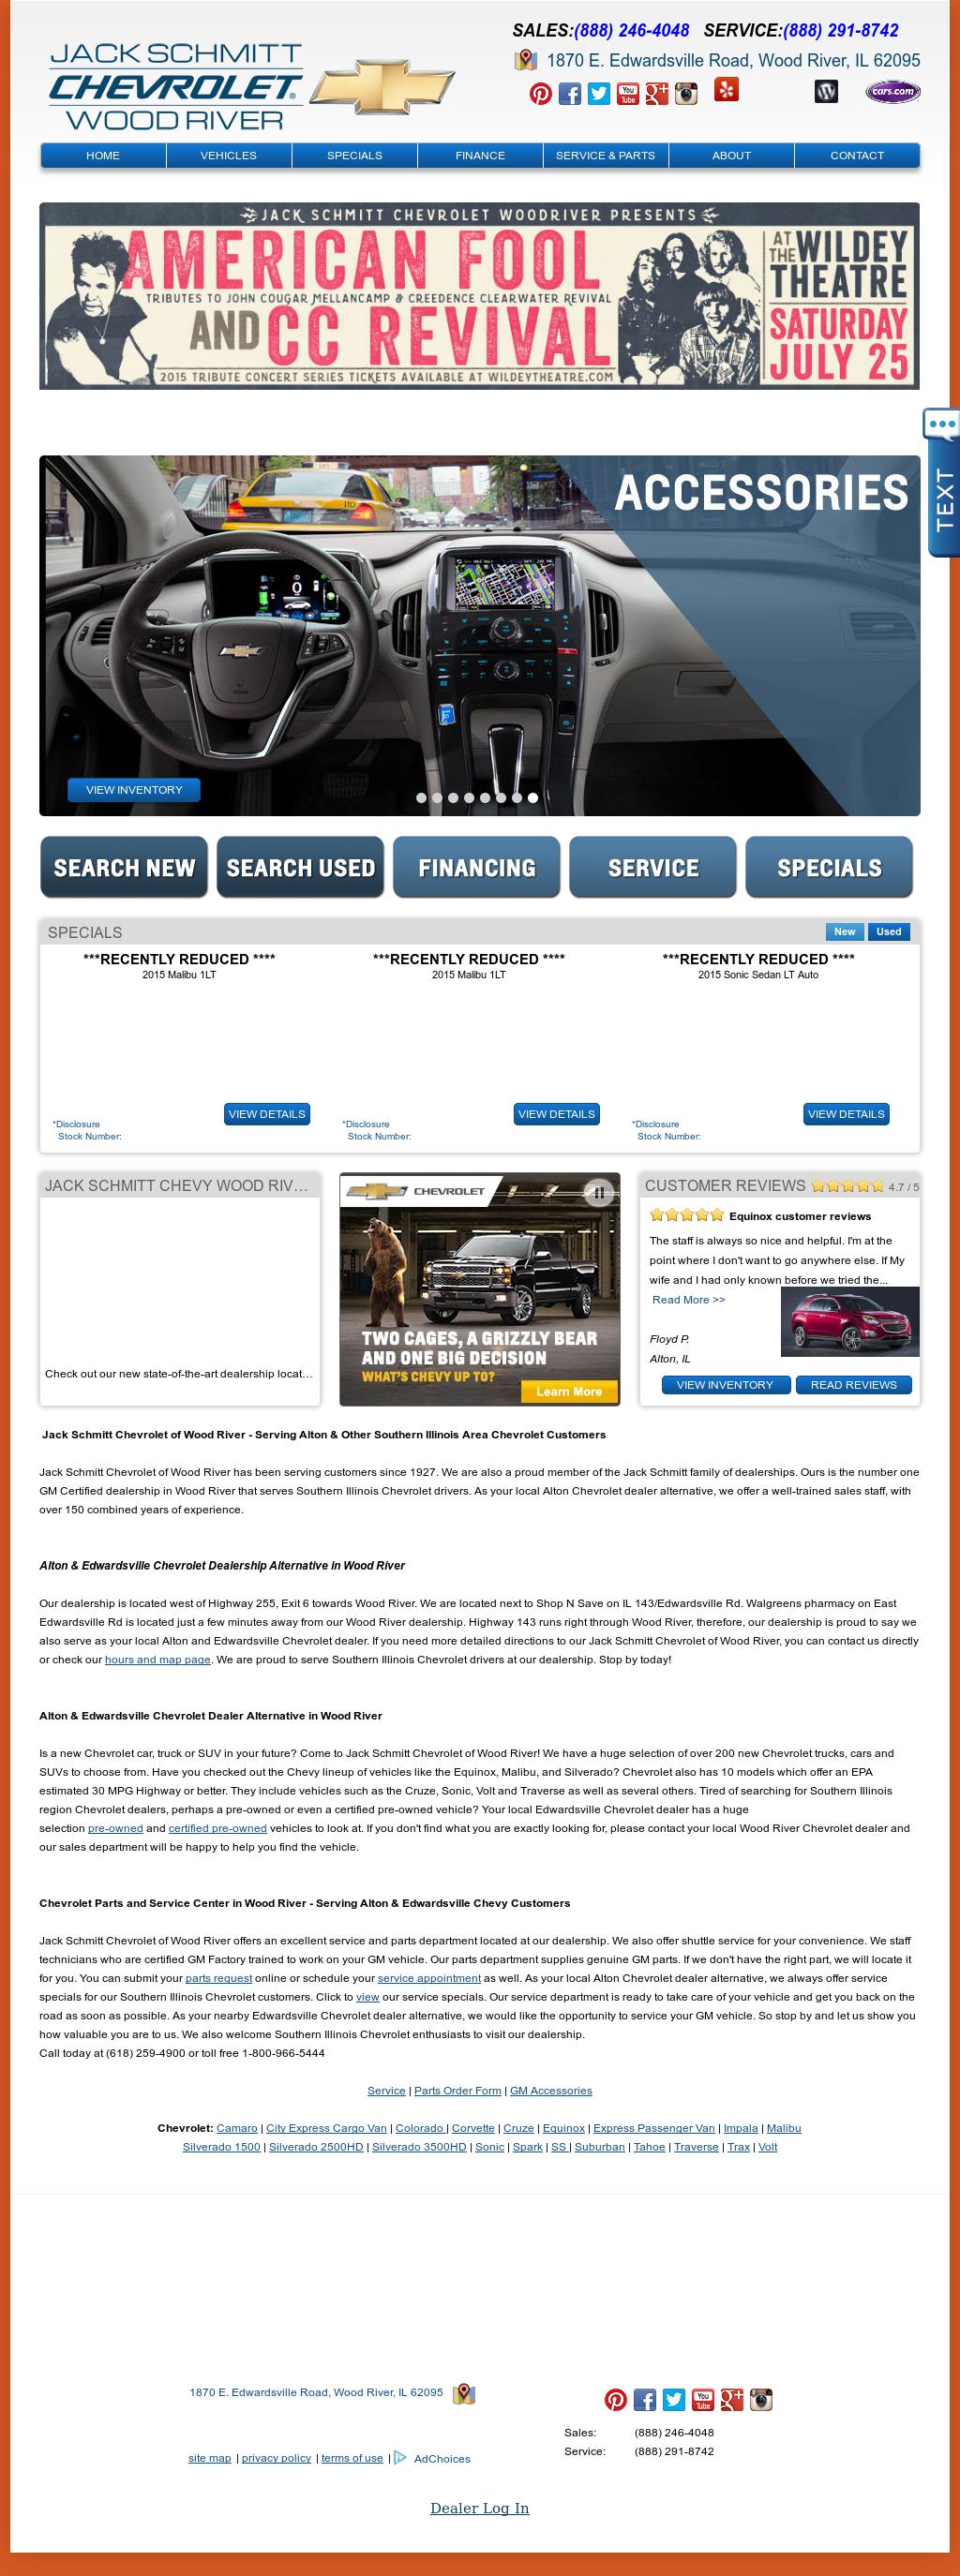 Jack Schmitt Chevrolet Of Wood River Website History